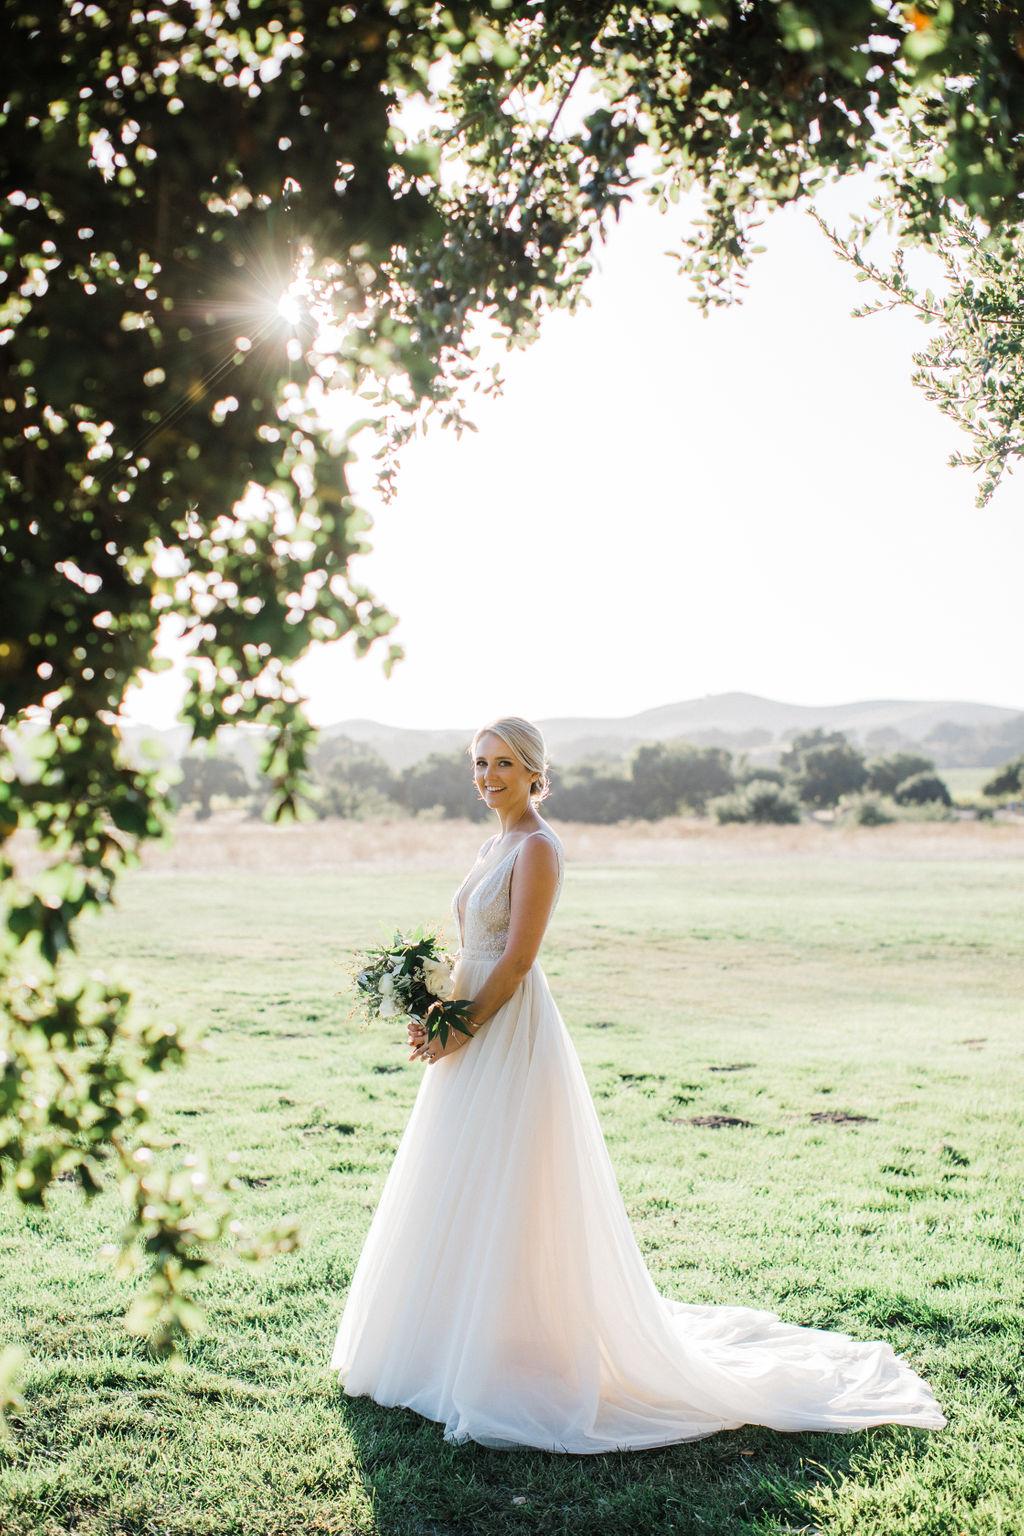 alegria-by-design-wedding-planner-planning-event-design-coordinator-day-of-month-crossroads-estate-garden-vineyard-firestone-barn-location-rustic-santa-barbara (1 (8).JPG